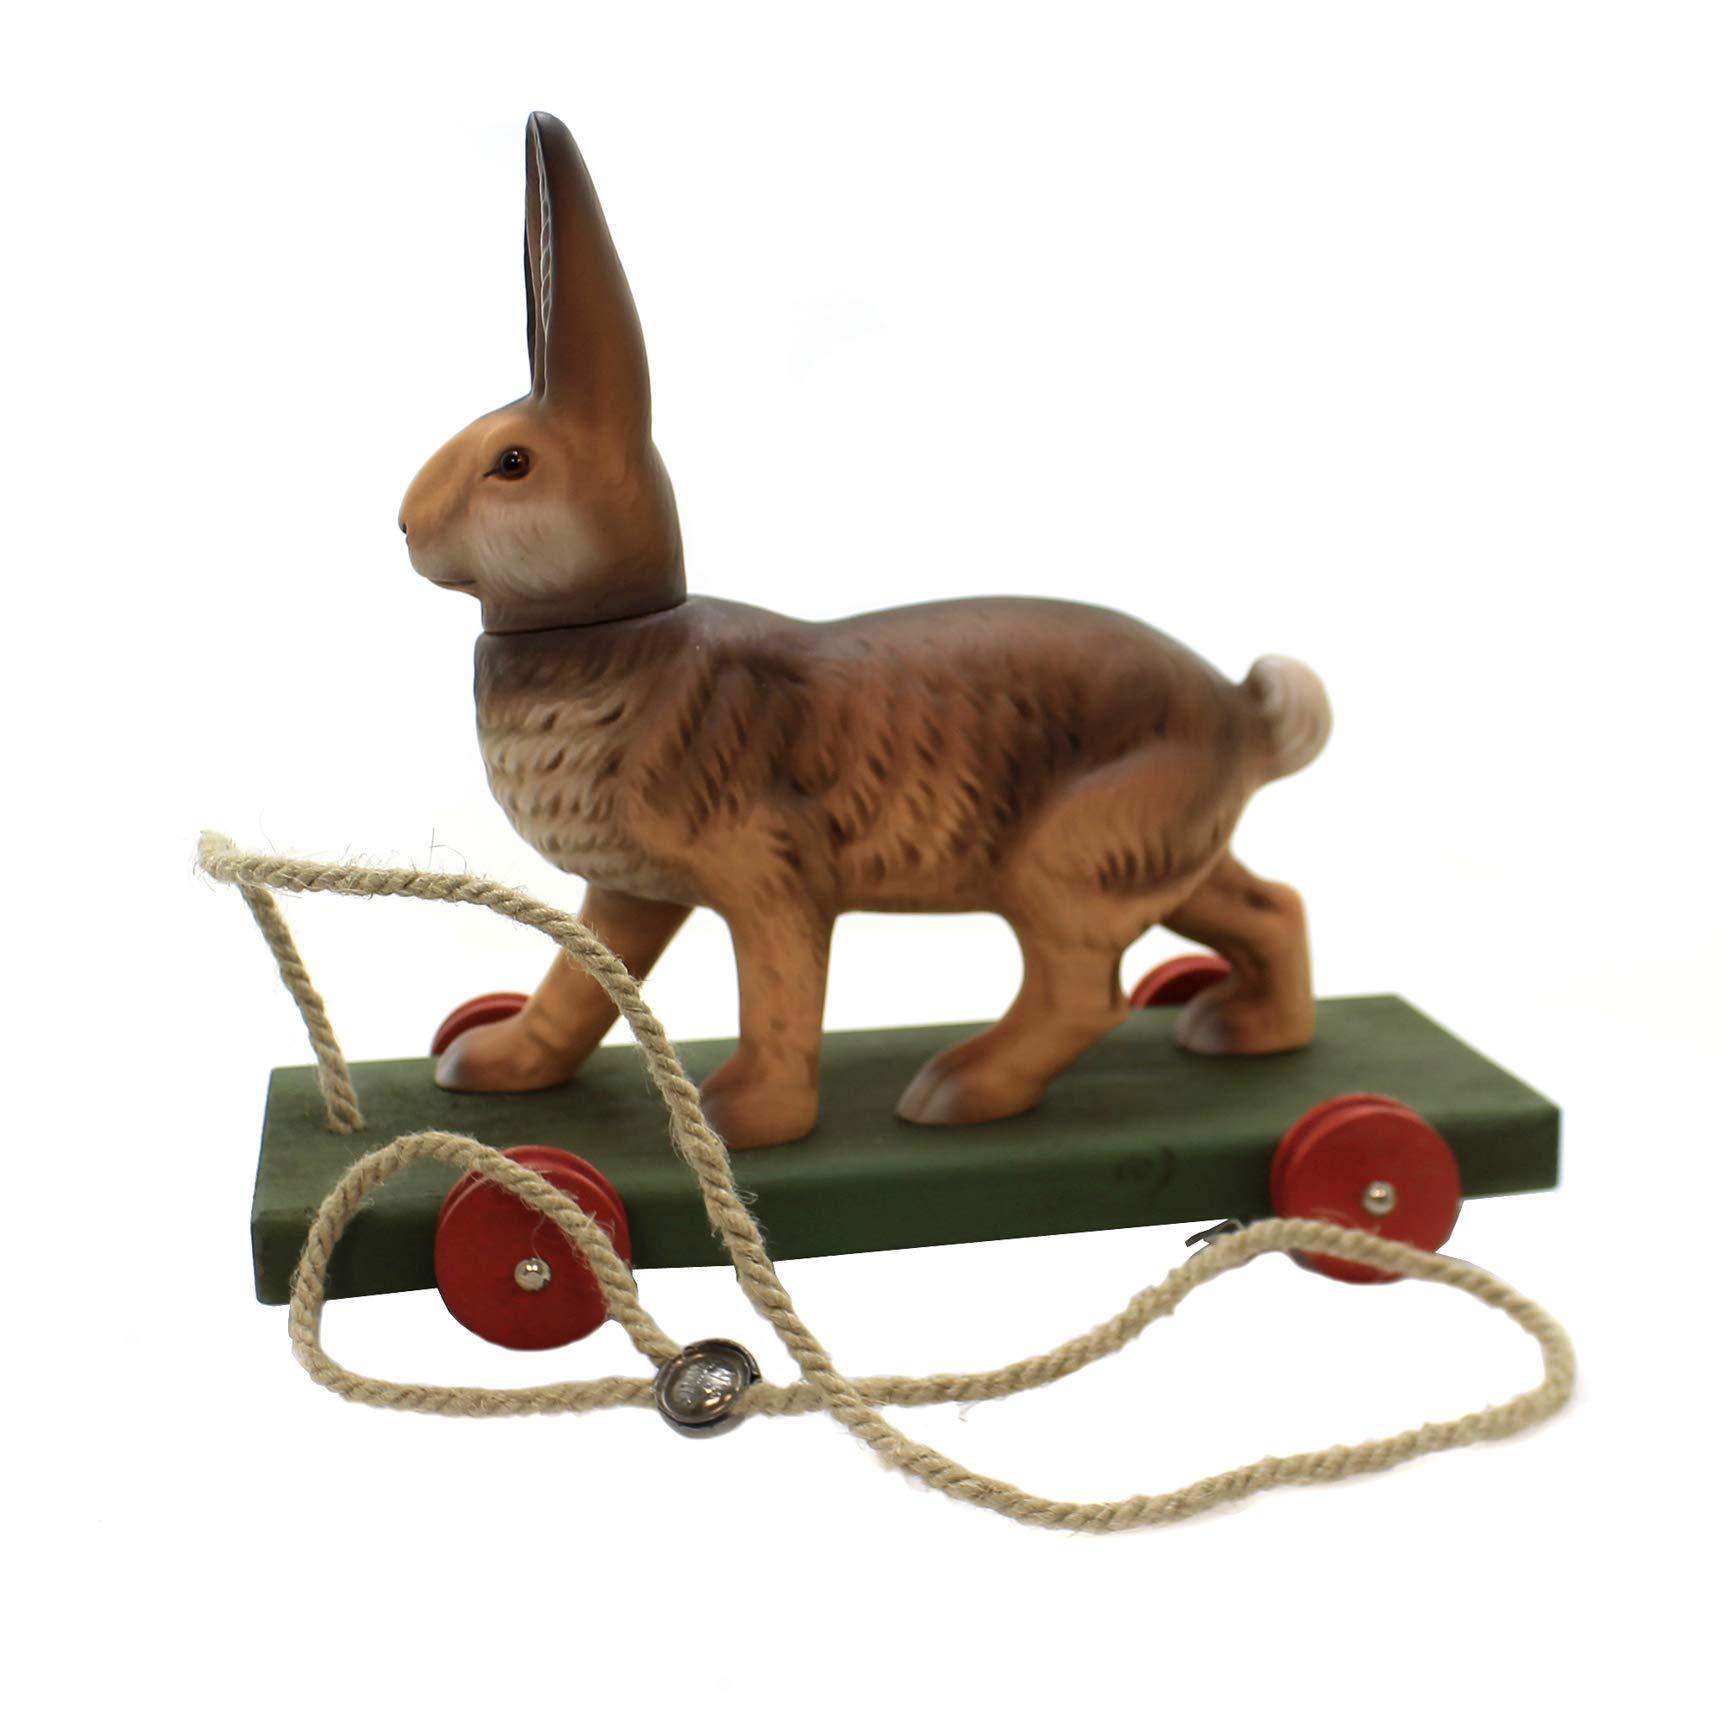 Marolin Bunny Pull Toy Paper Mache Vintage Looking Hare Rabbit 990